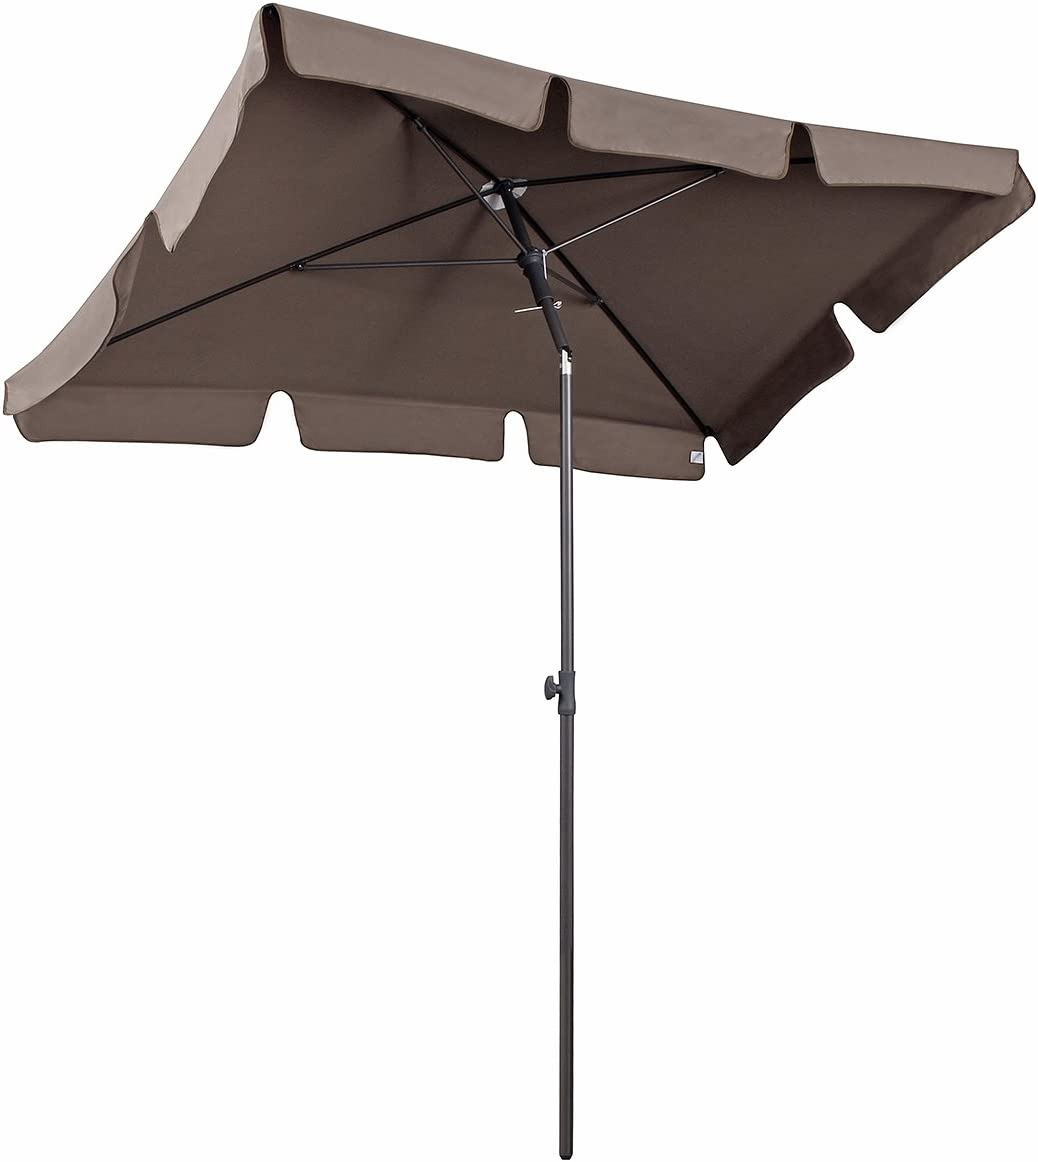 Sekey® Sombrilla 200 x 125cm Parasole para Terraza Jardín Playa Balcón Piscina Patio ,Protector Solar UV50+ , Rectángulo (Taupe)